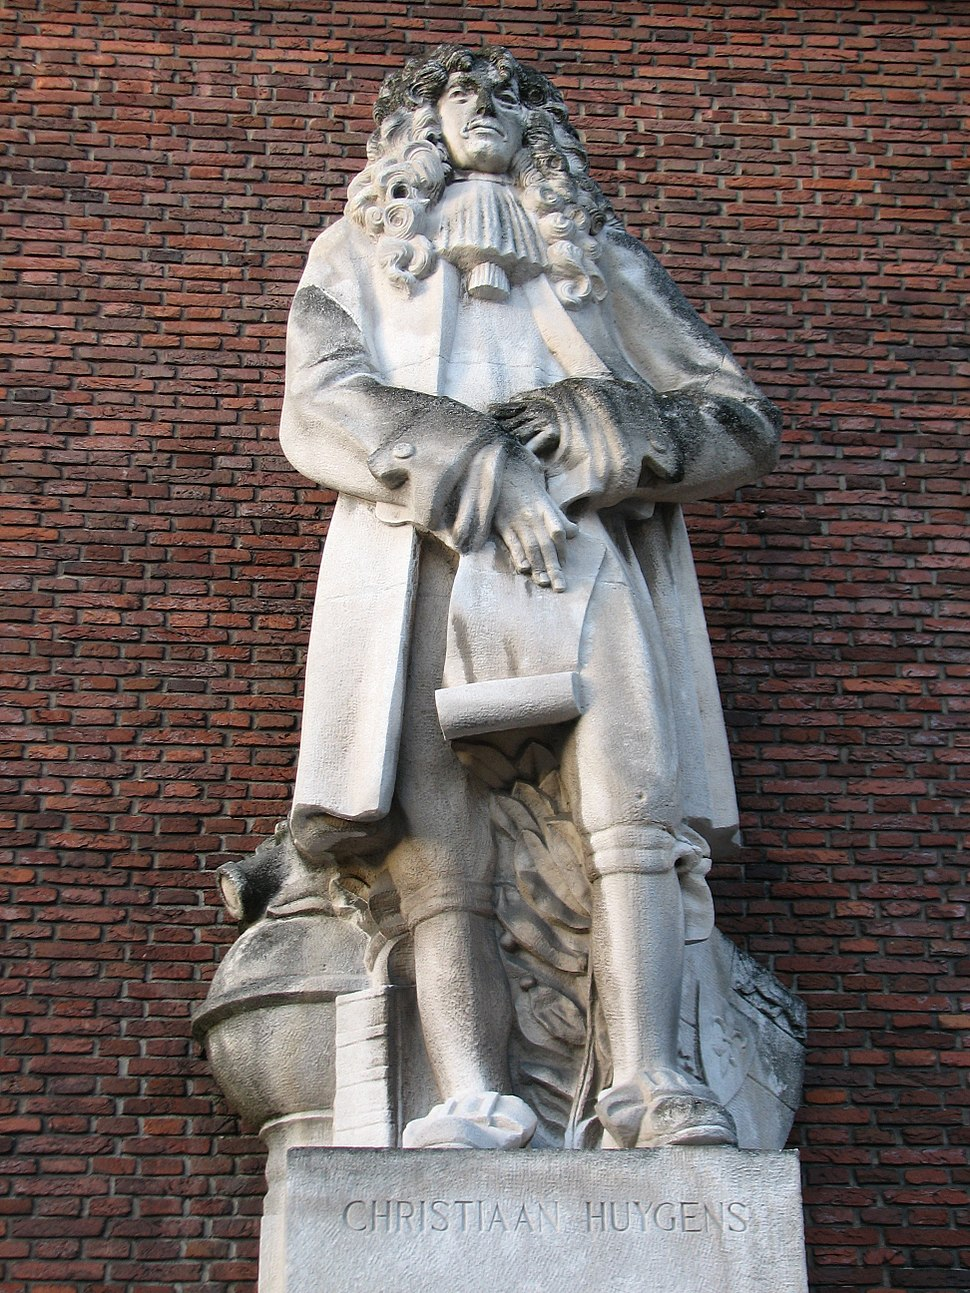 Christiaan Huygens Statue Rotterdam